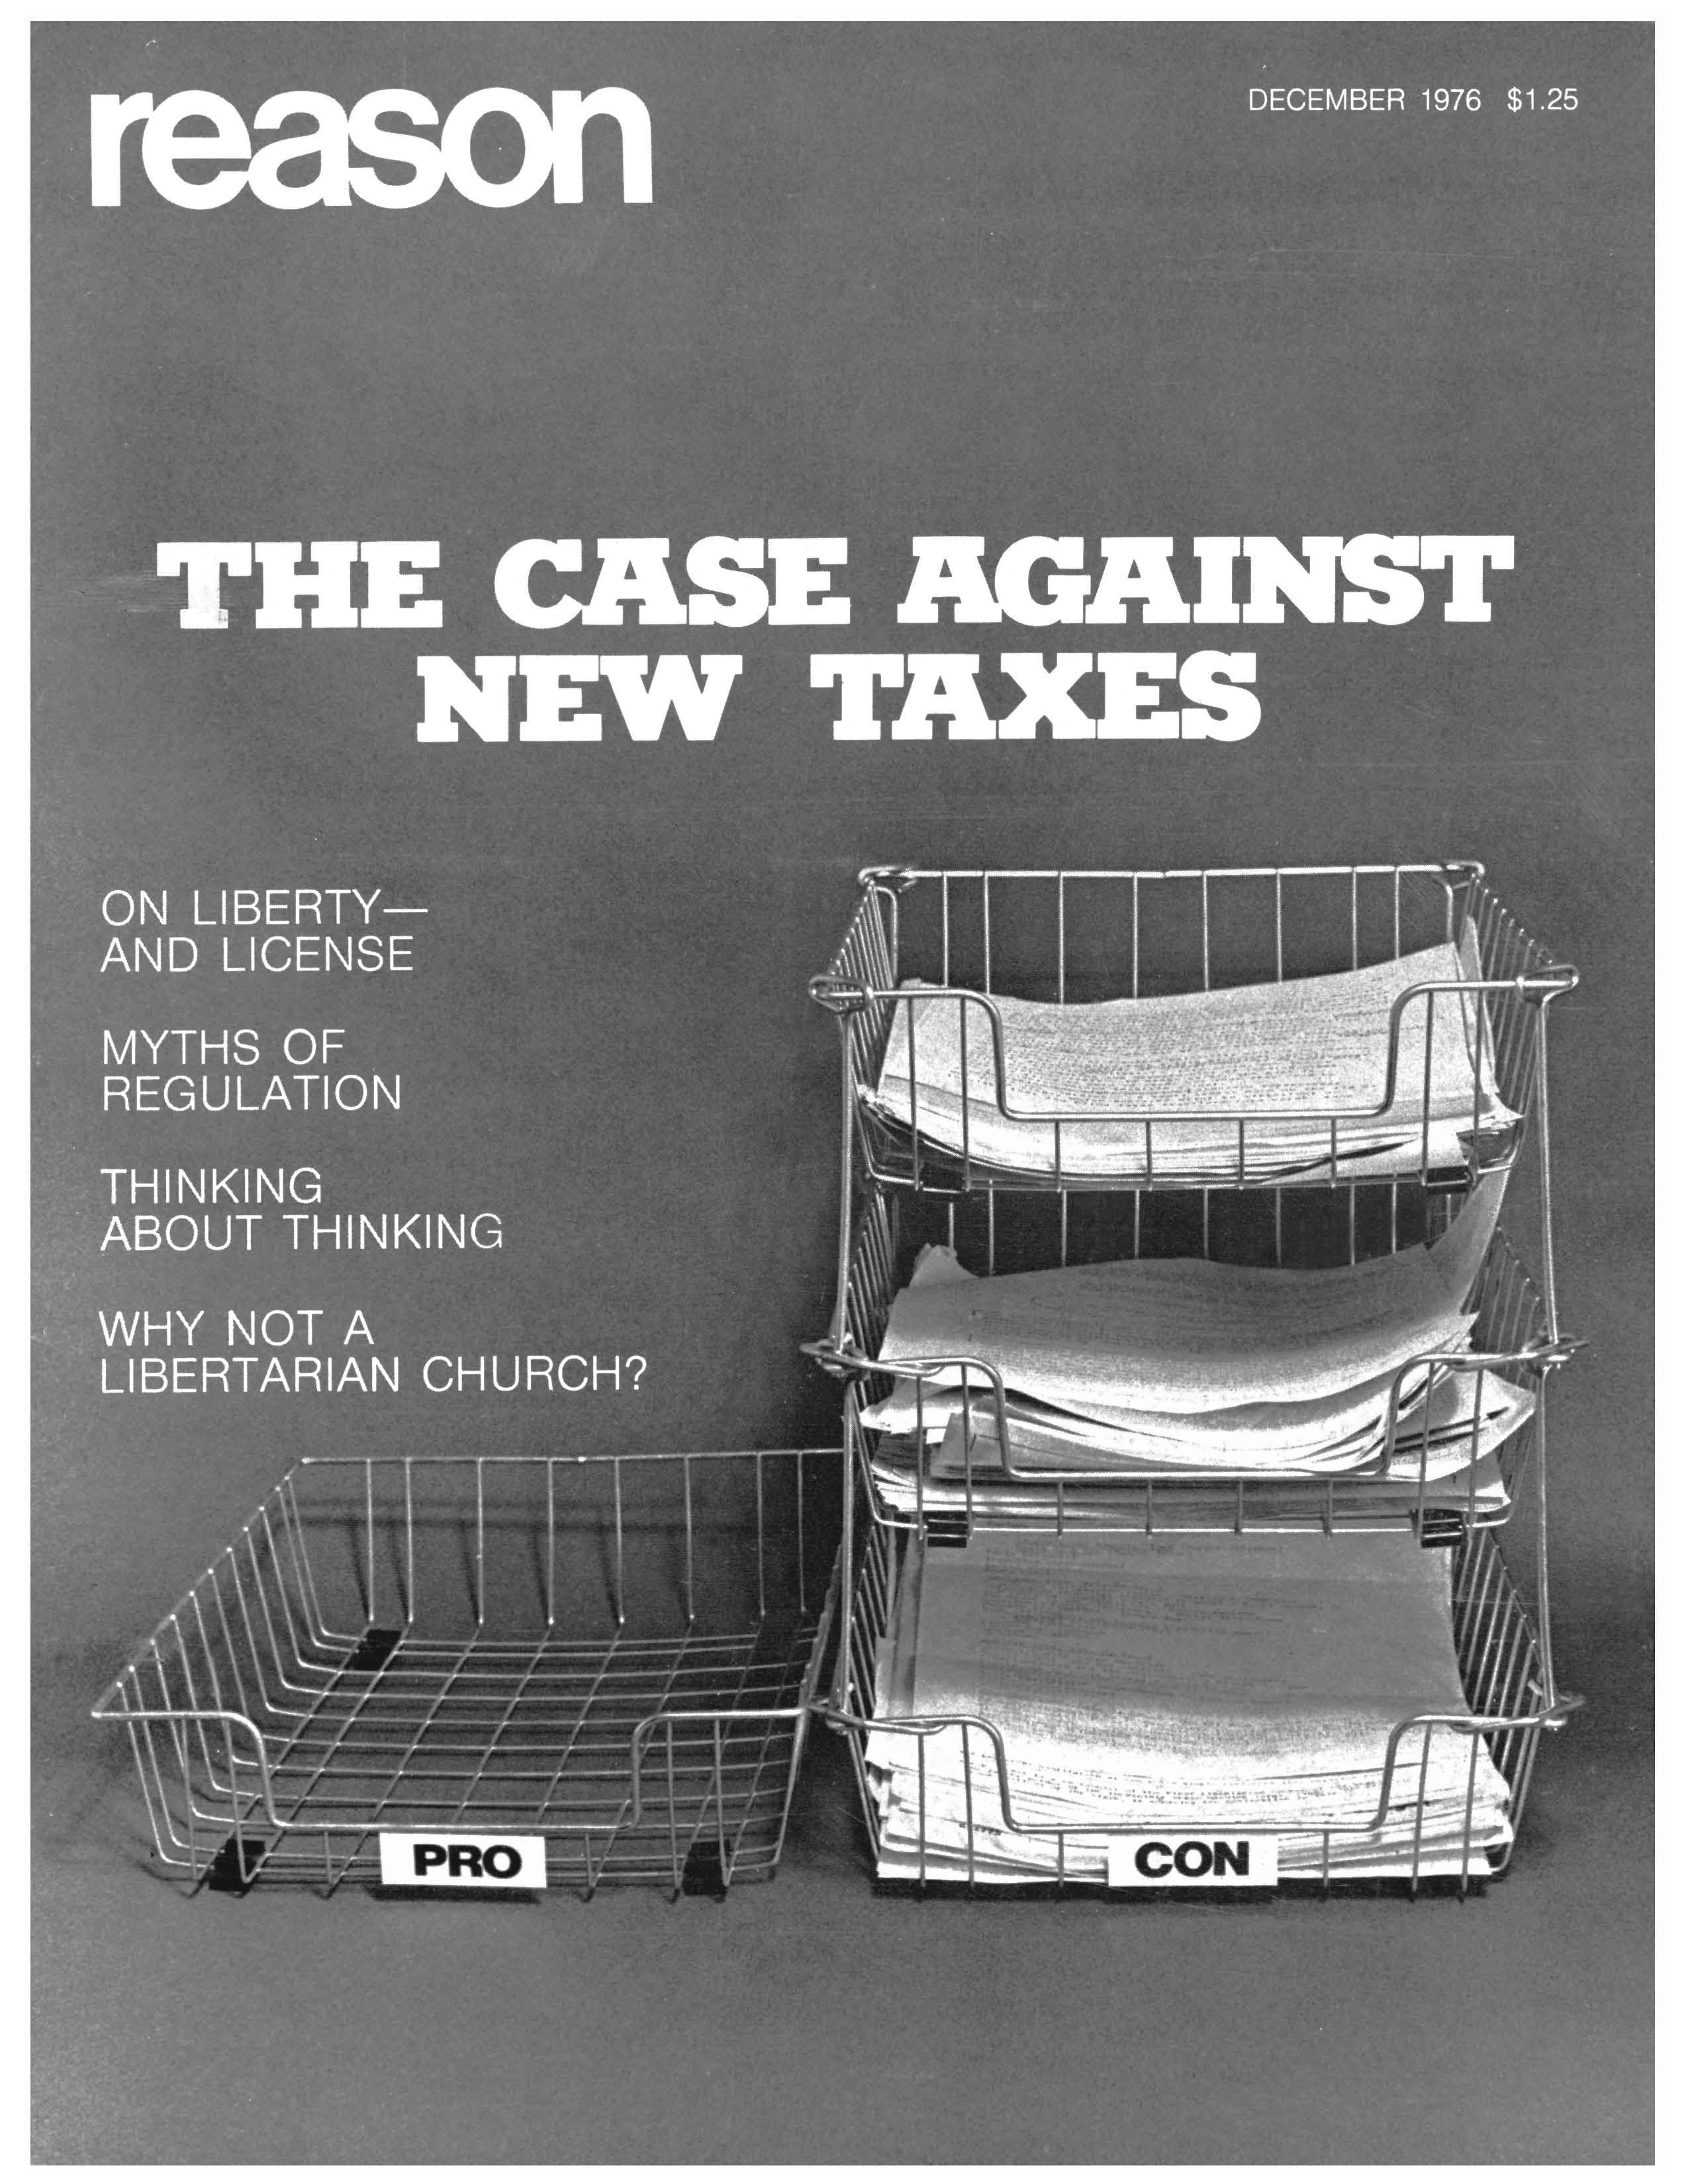 Reason Magazine, December 1976 cover image